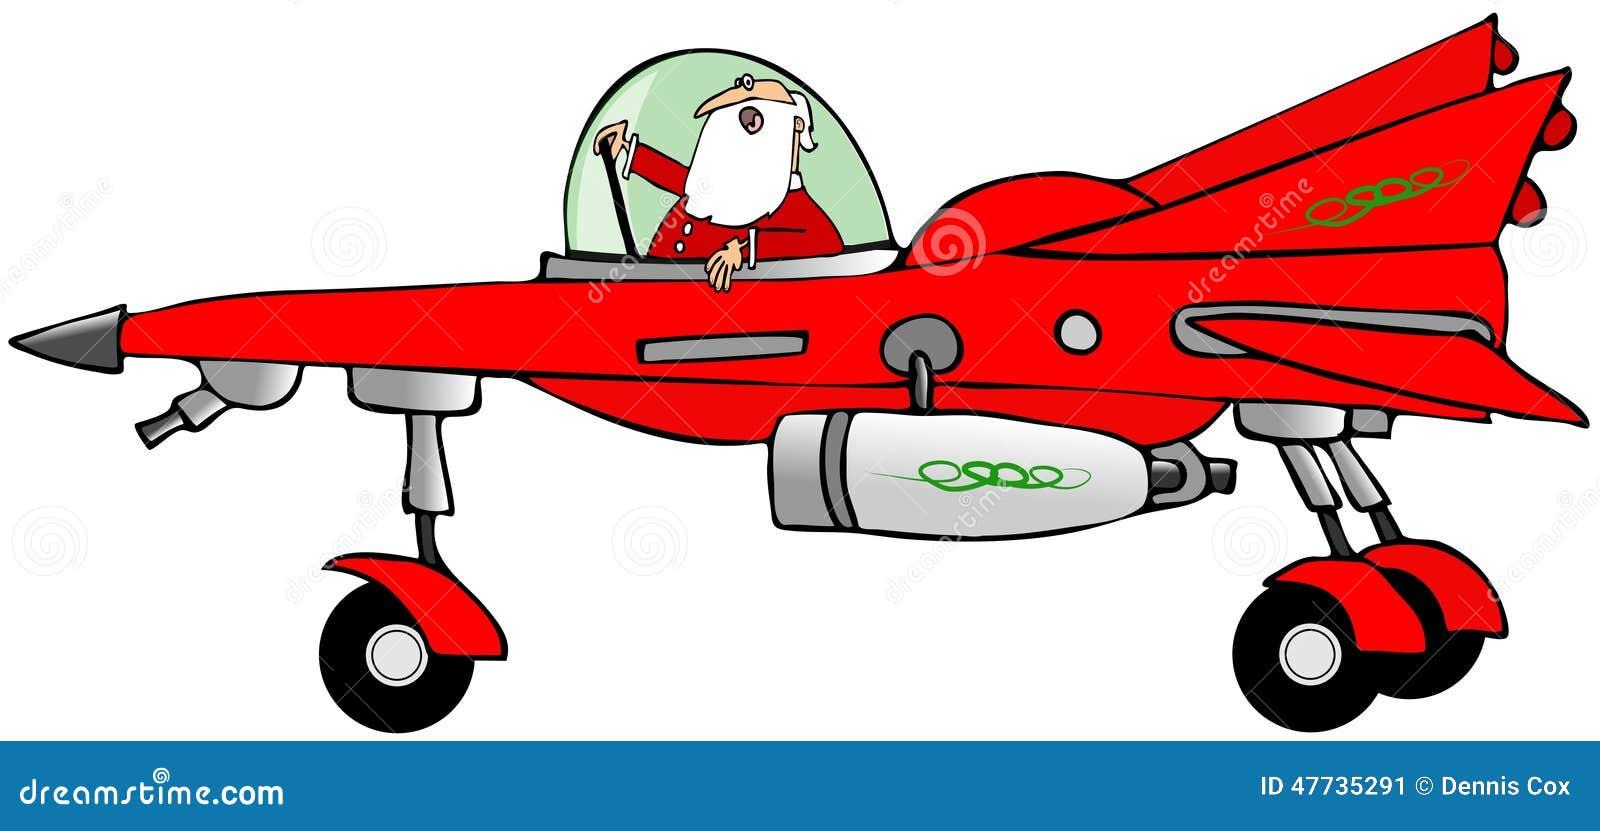 Santa w starfighter